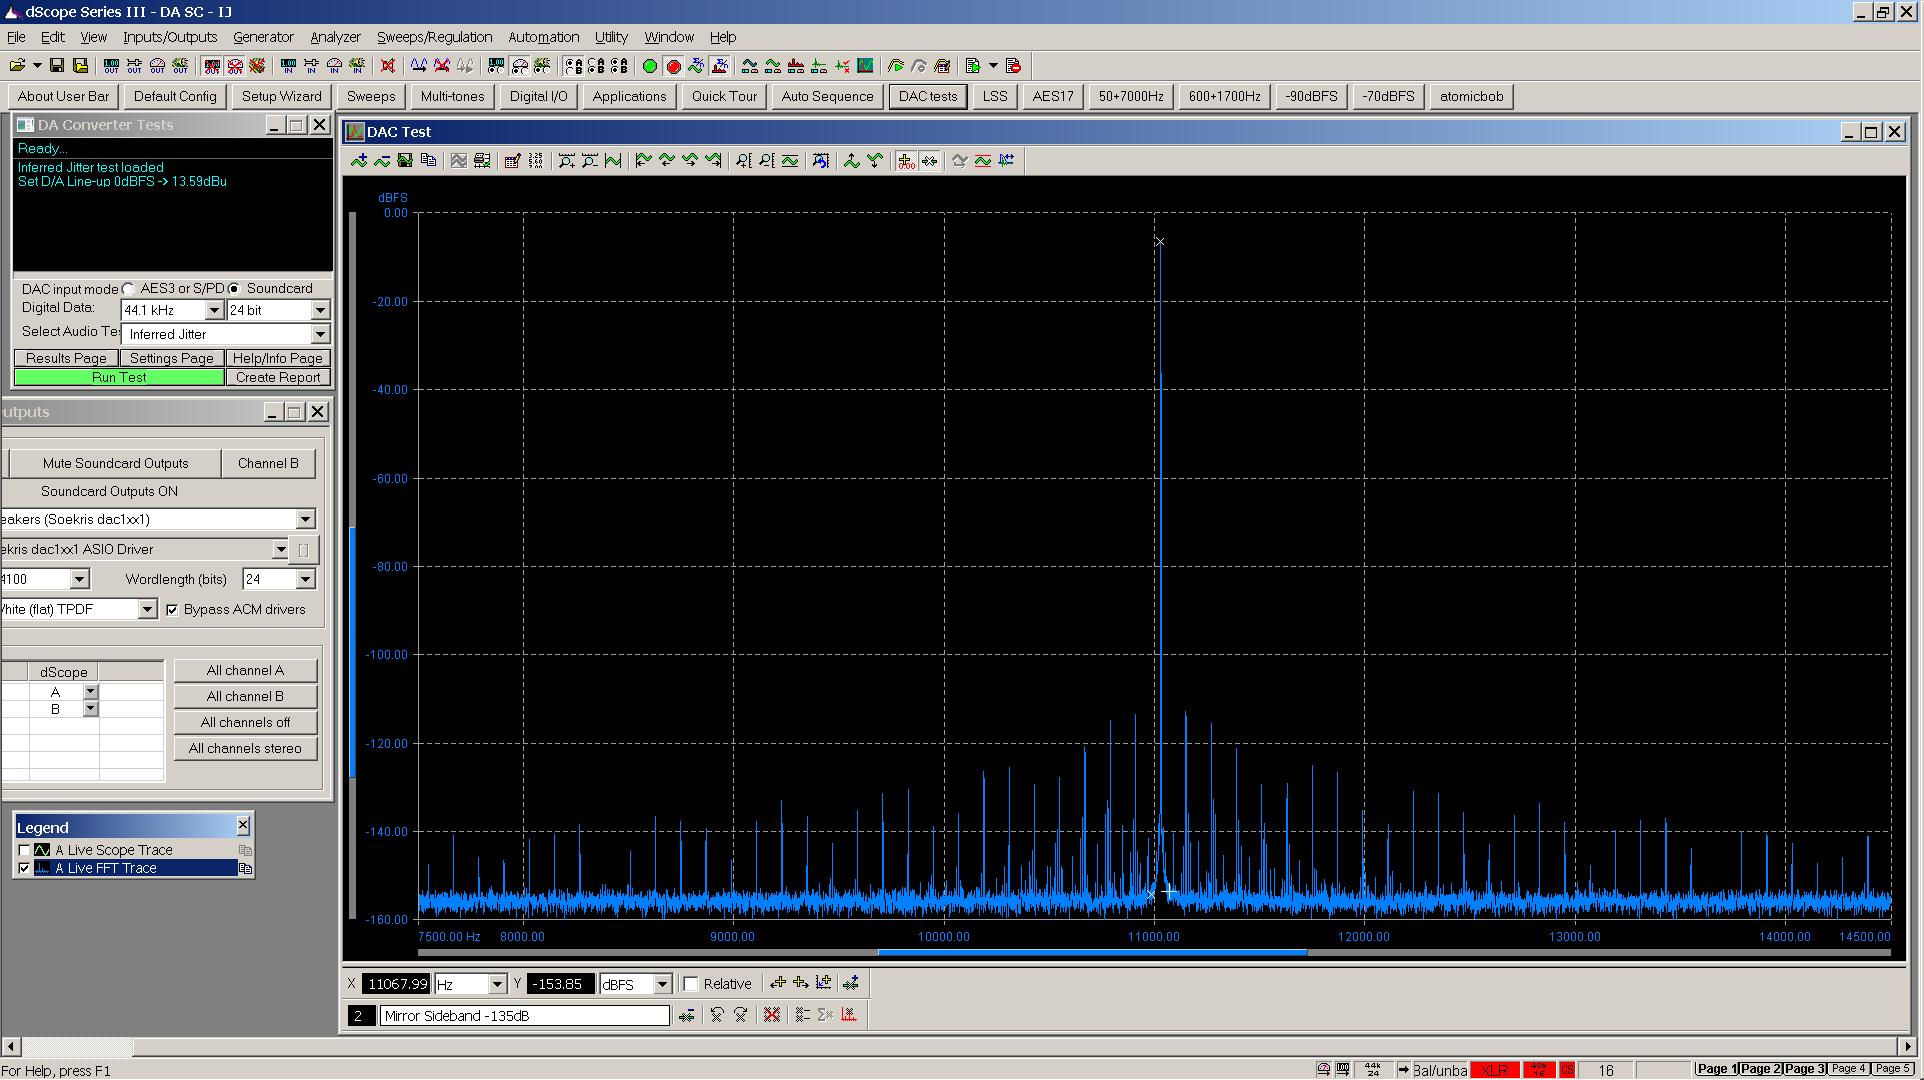 02 Bal inferred jitter - WDM.PNG